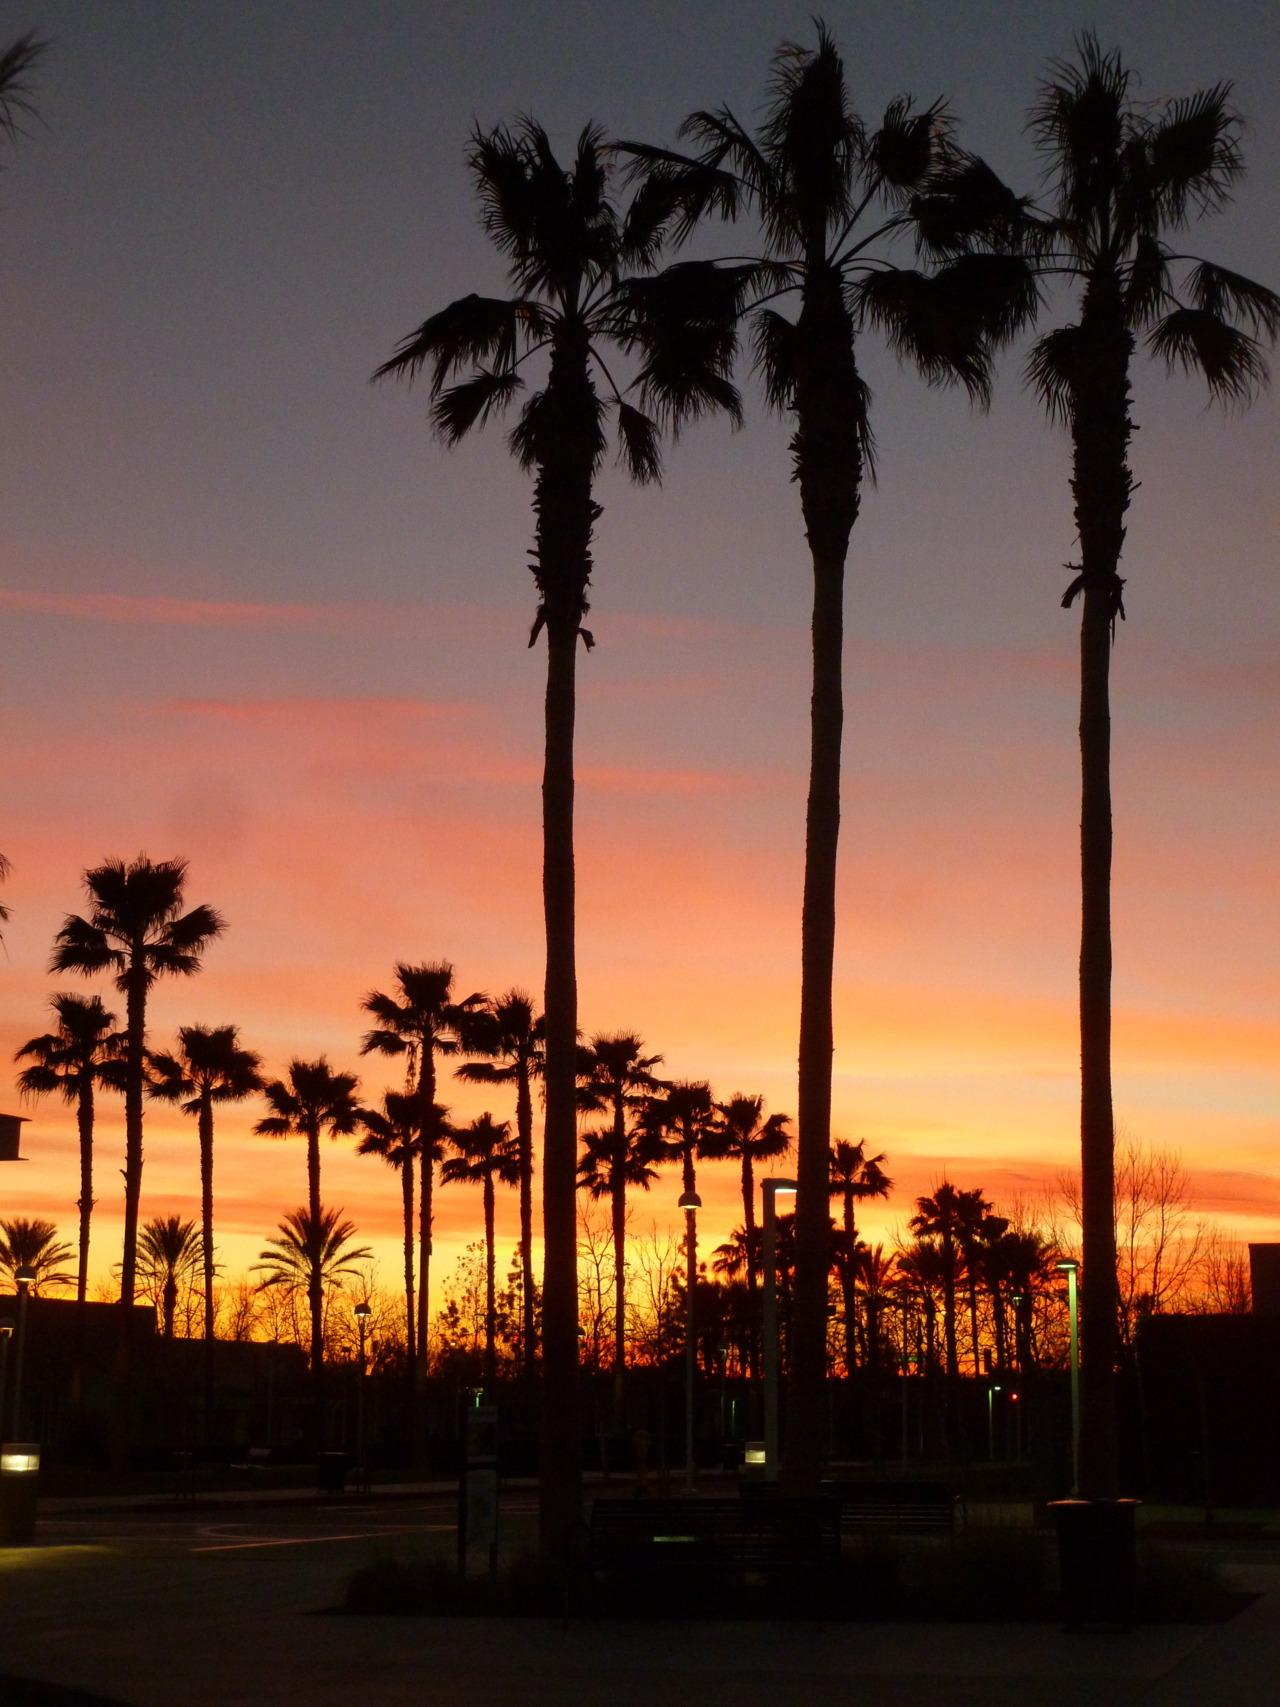 palm trees sunset tumblr. palm trees sunset tumblr